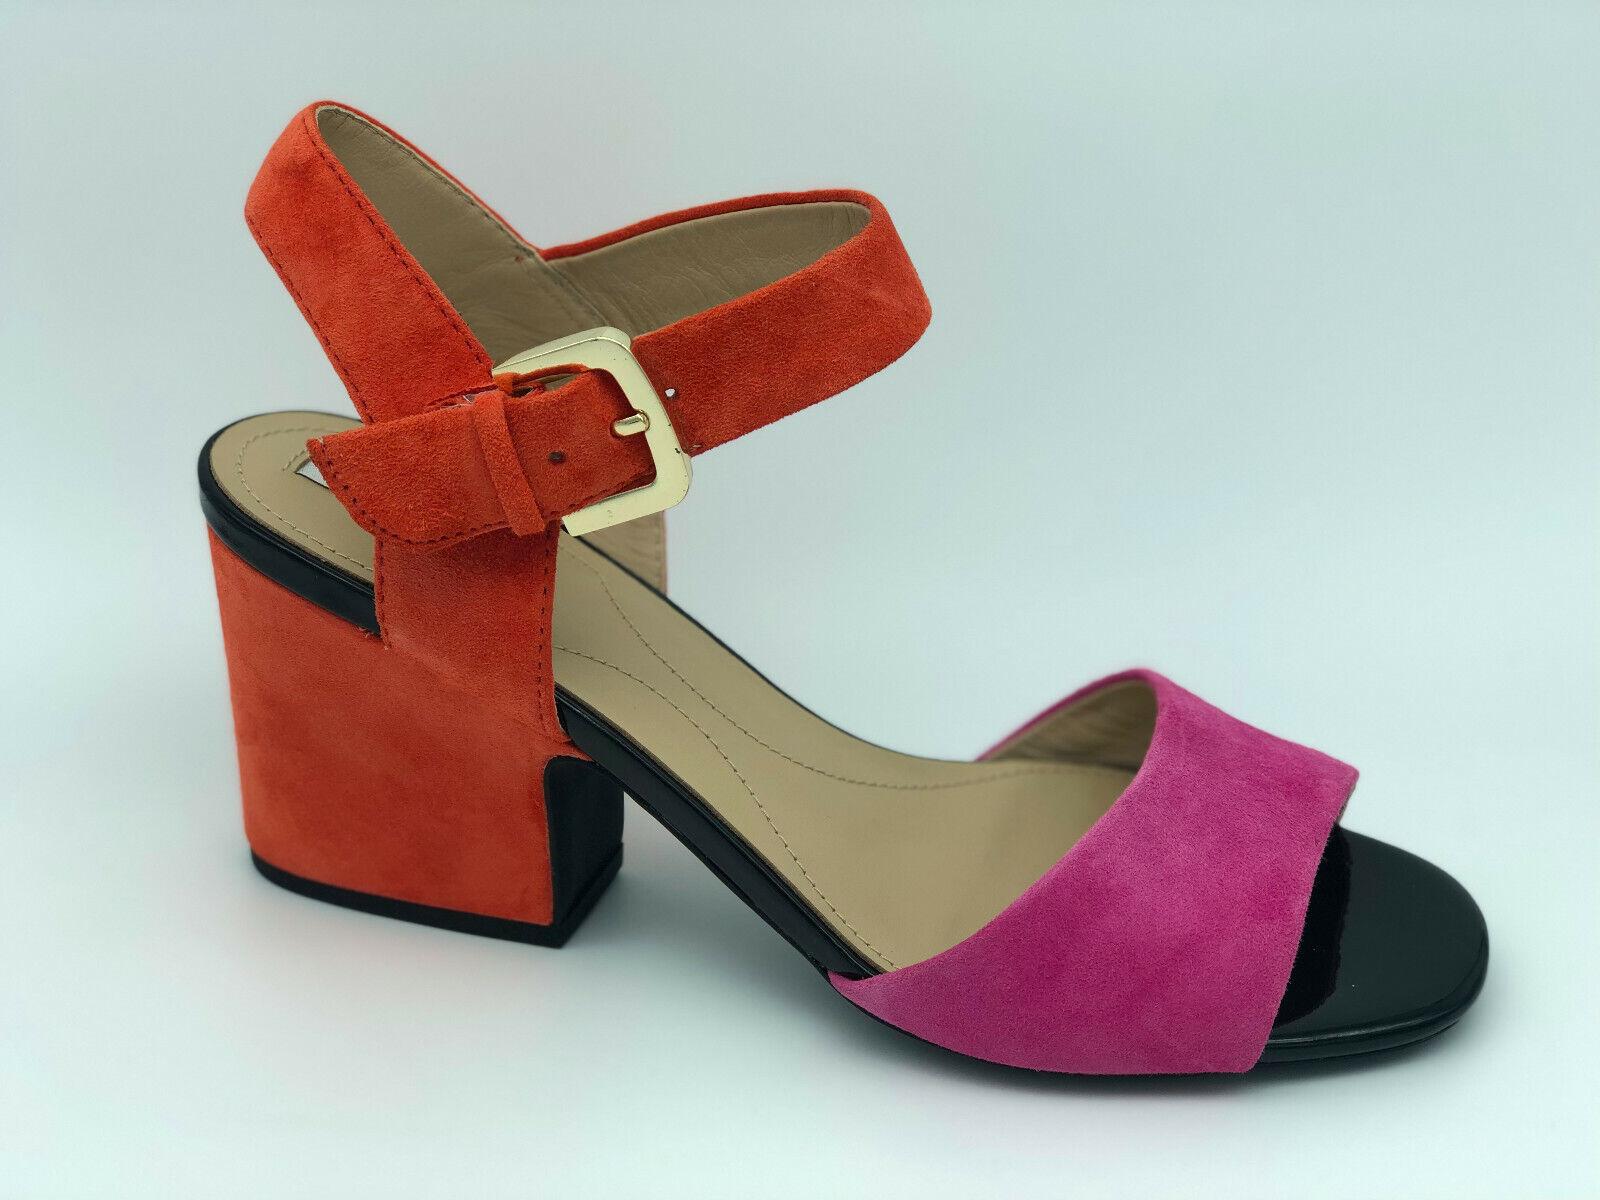 Sandali Geox D Marilyse B camoscio rose e arancio tacco 8,5 cm